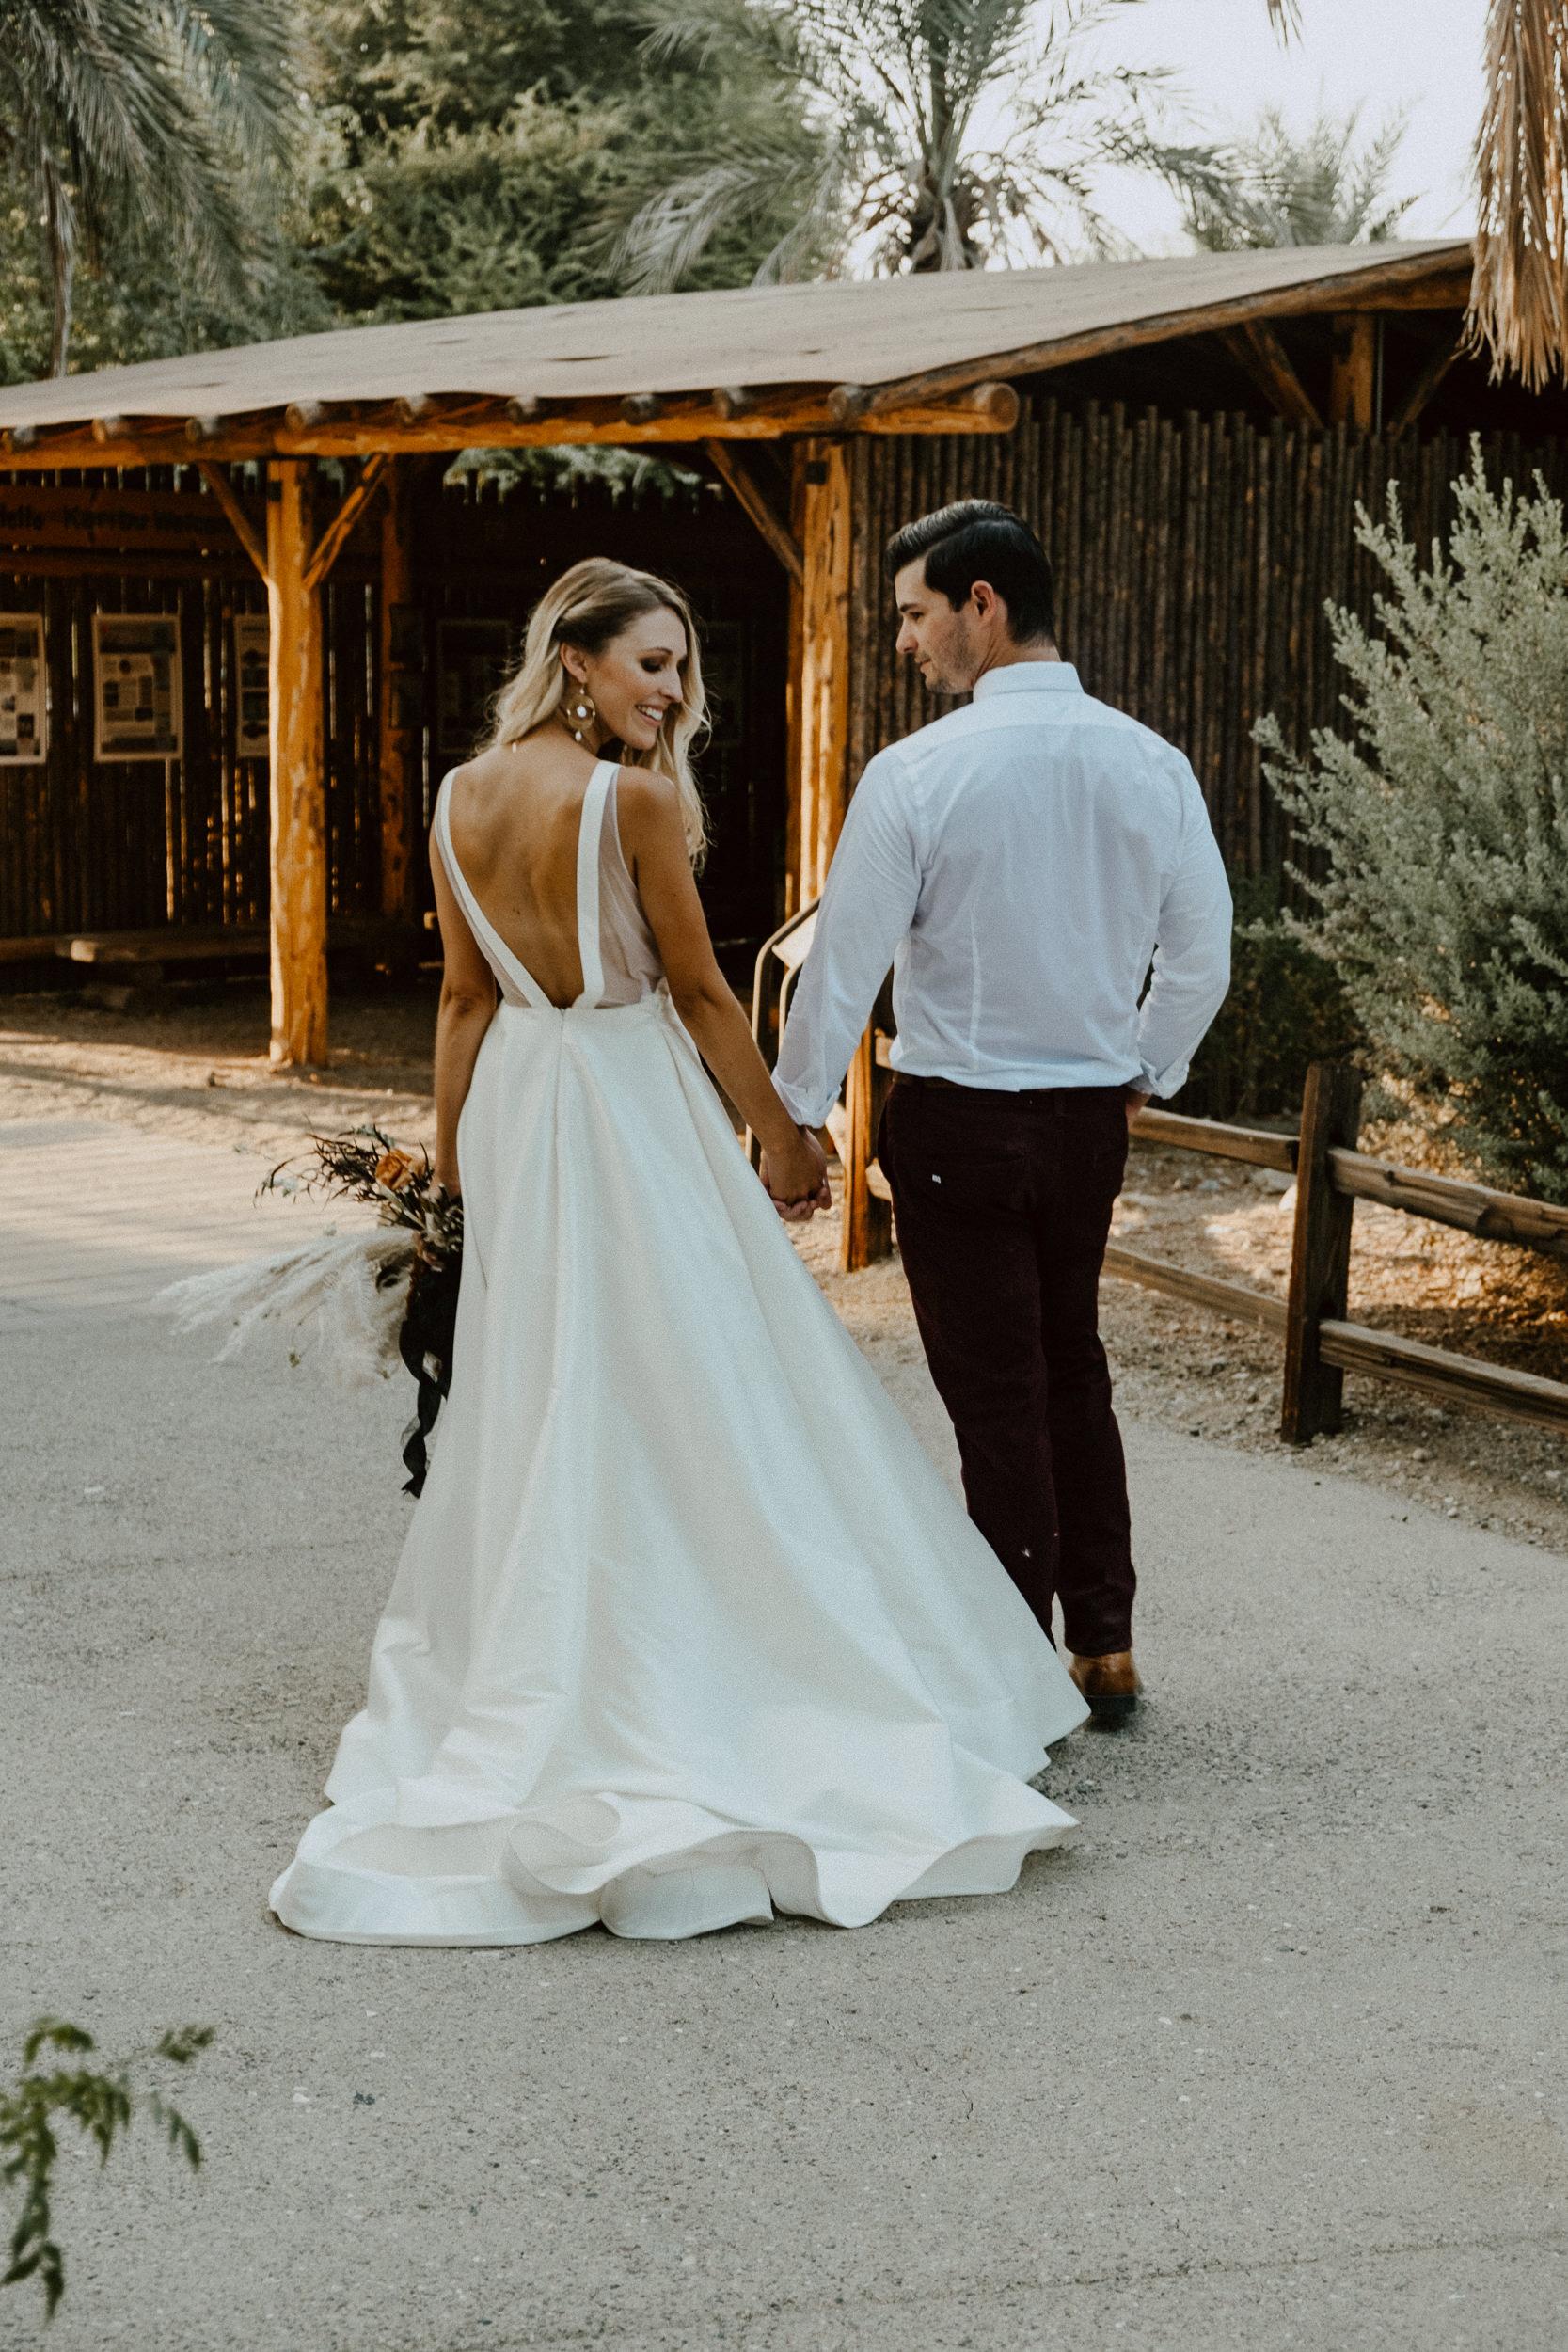 sChelsie + Chris - The Desert Shootout Wedding Romantics at The Living Desert-33.jpg